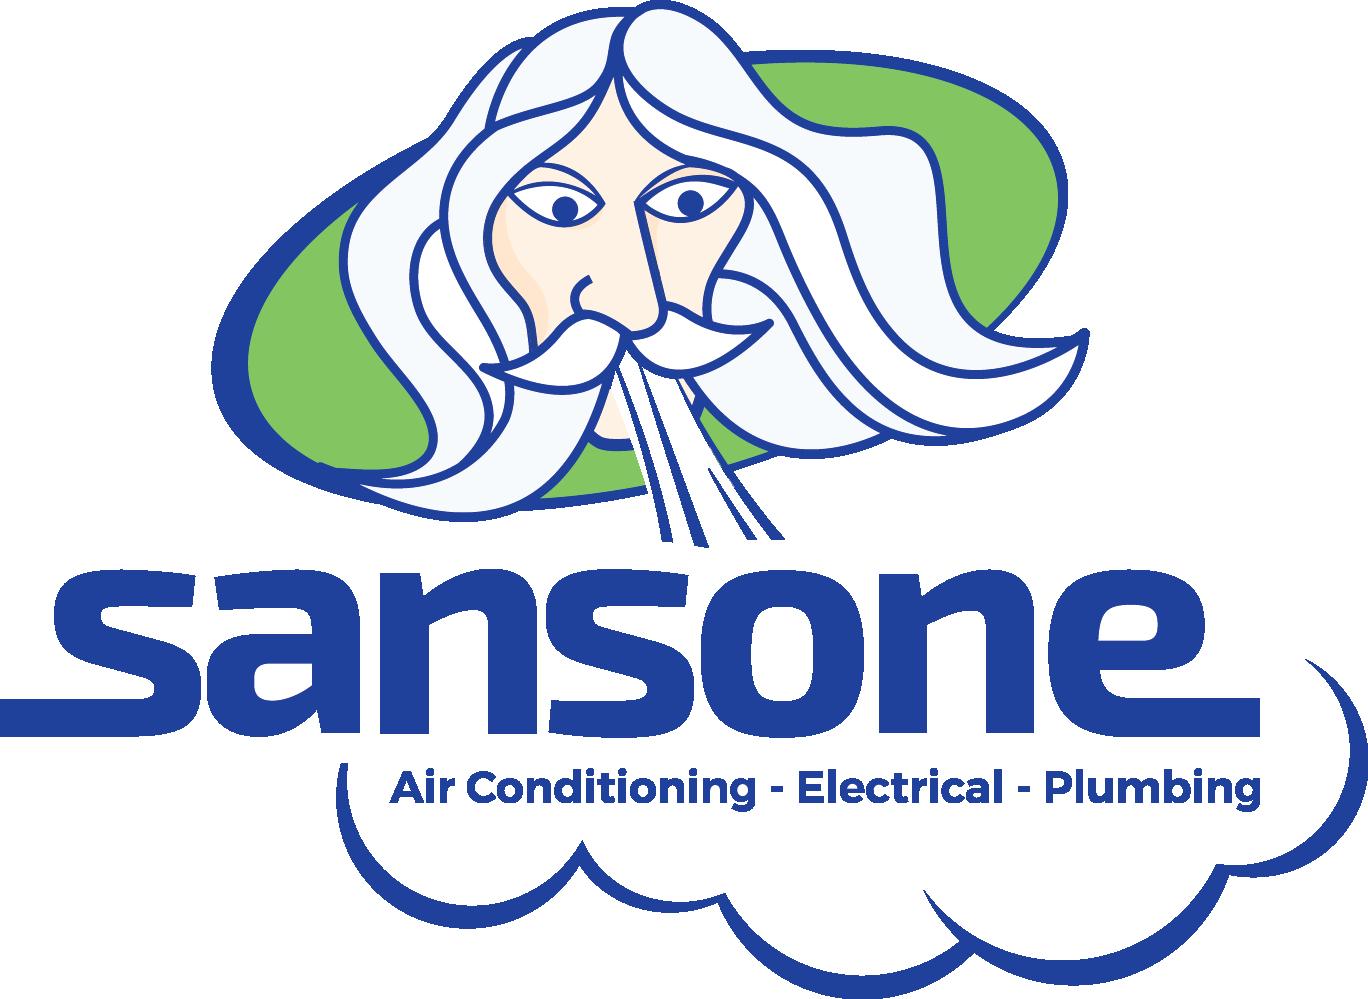 Sansone Air Conditioning logo